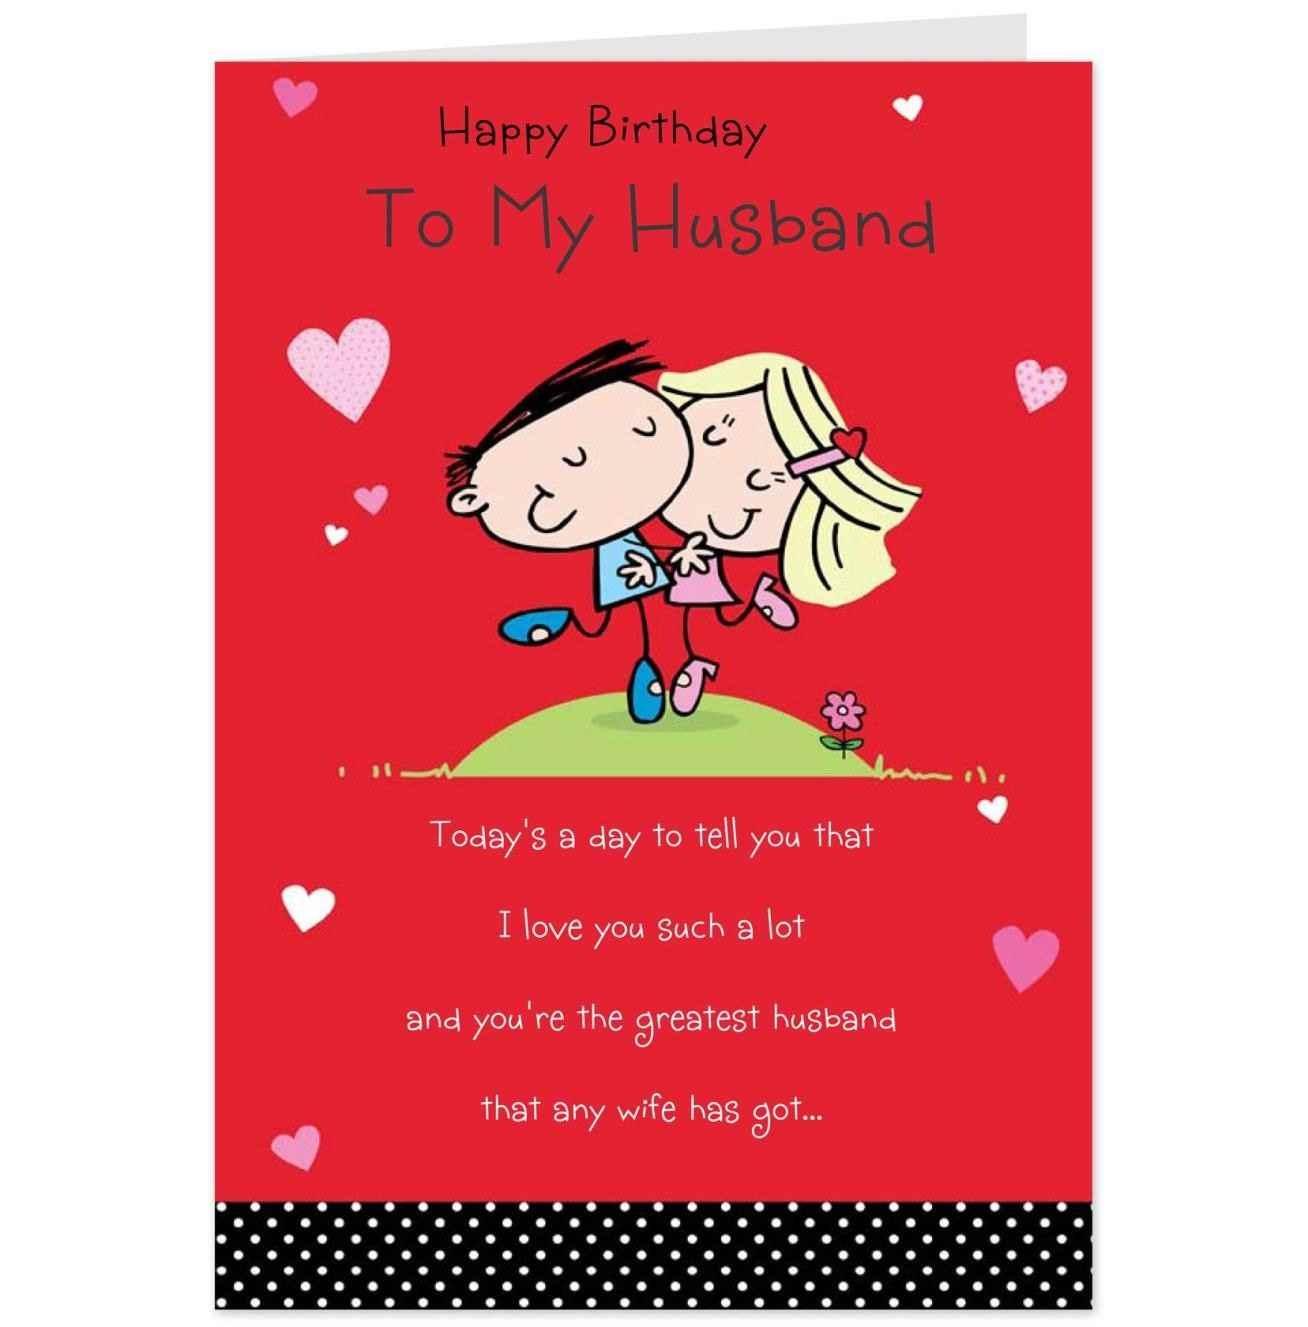 Printable Birthday Cards For Husband — Birthday Invitation Examples - Free Printable Birthday Cards For Husband